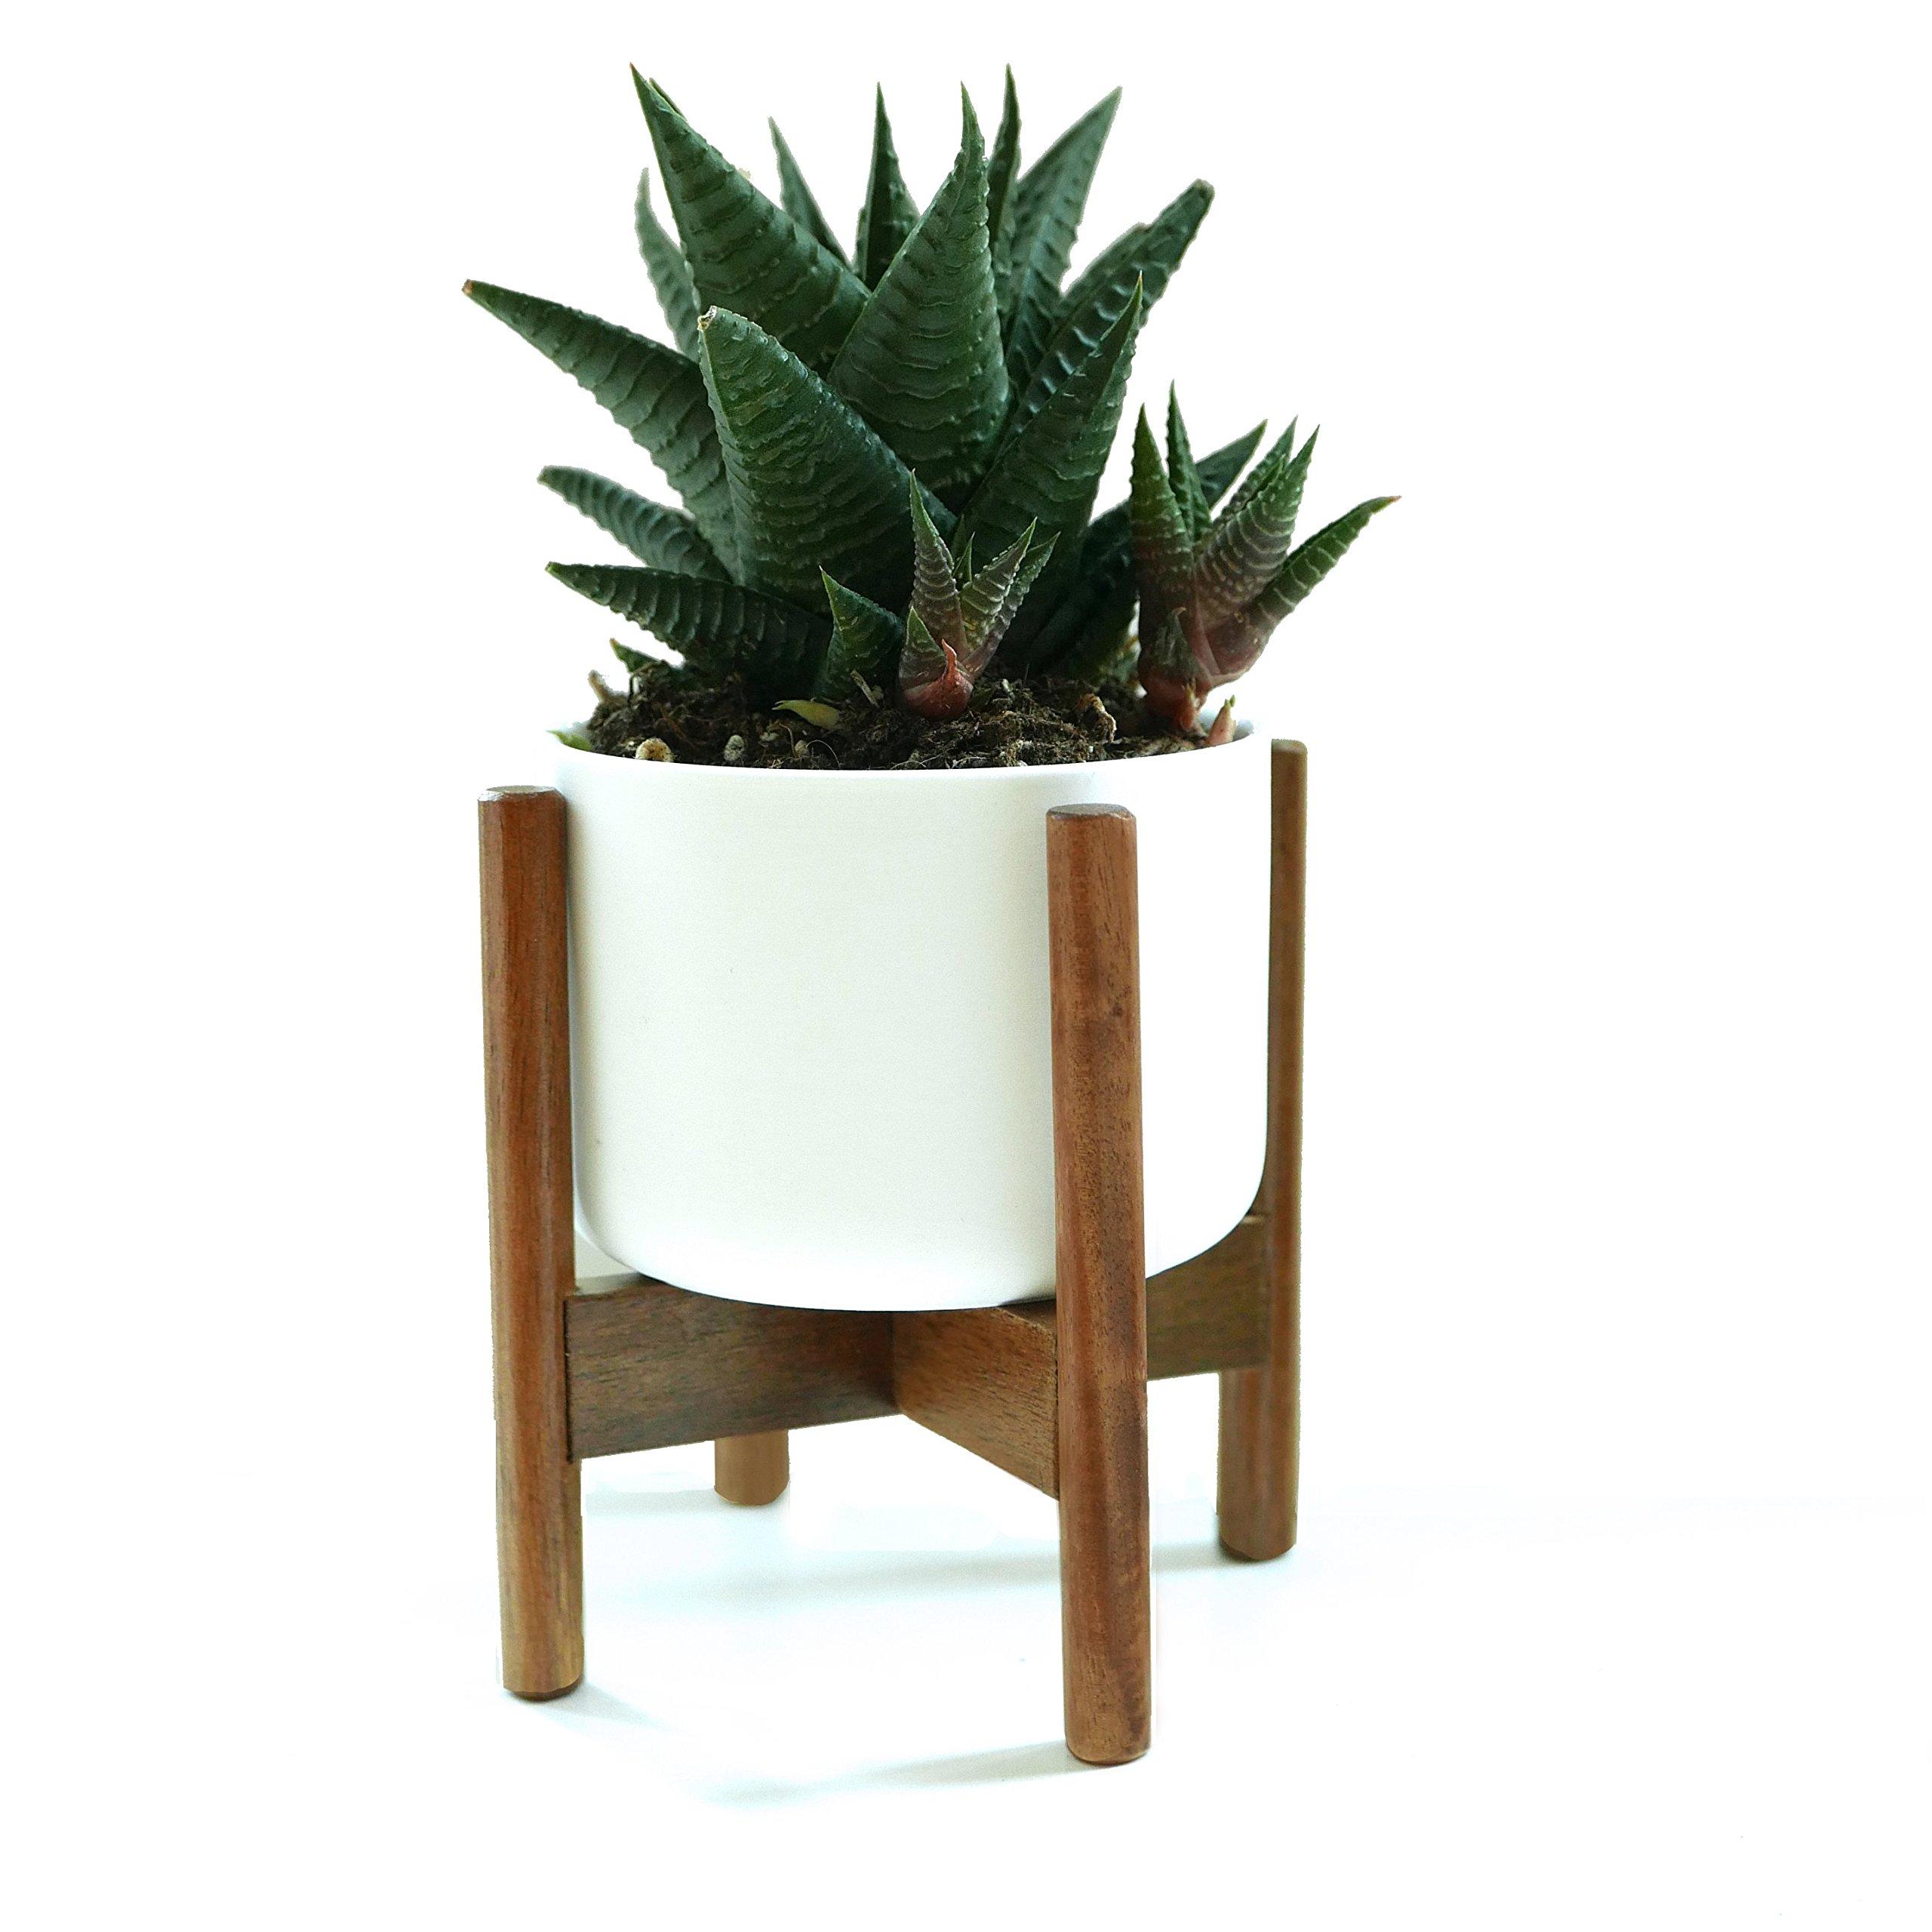 FOX & FERN Mid-Century Modern Mini Plant Stand - Acacia - Including 3.5'' White Ceramic Planter Pot by Fox & Fern